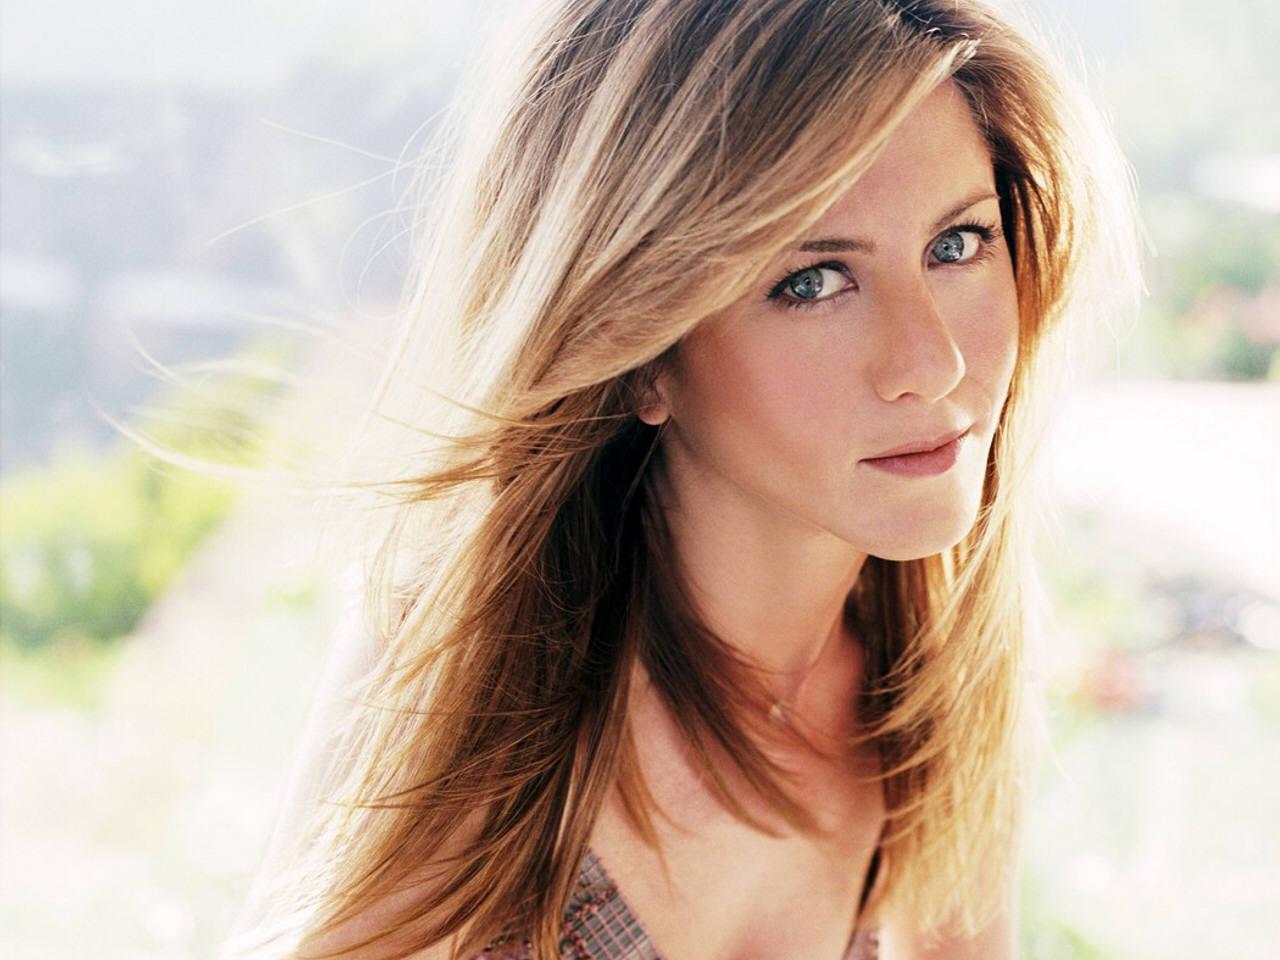 Jennifer Aniston Wallpaper